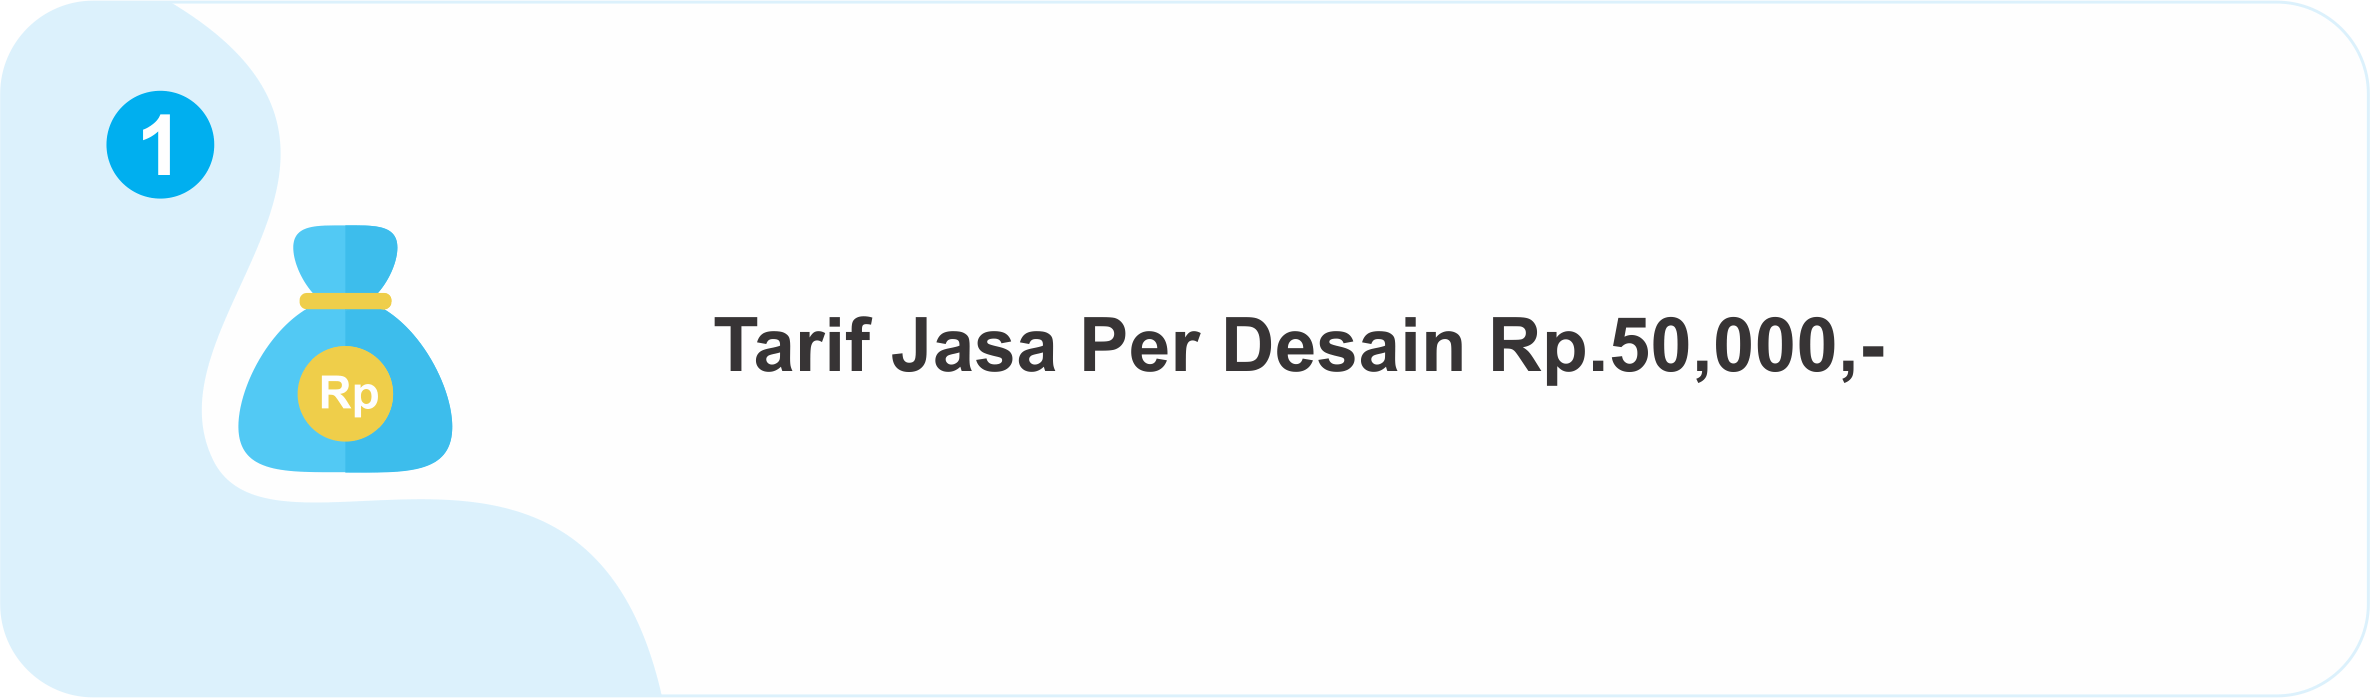 Jasa Desain 1 Digibook Promotion